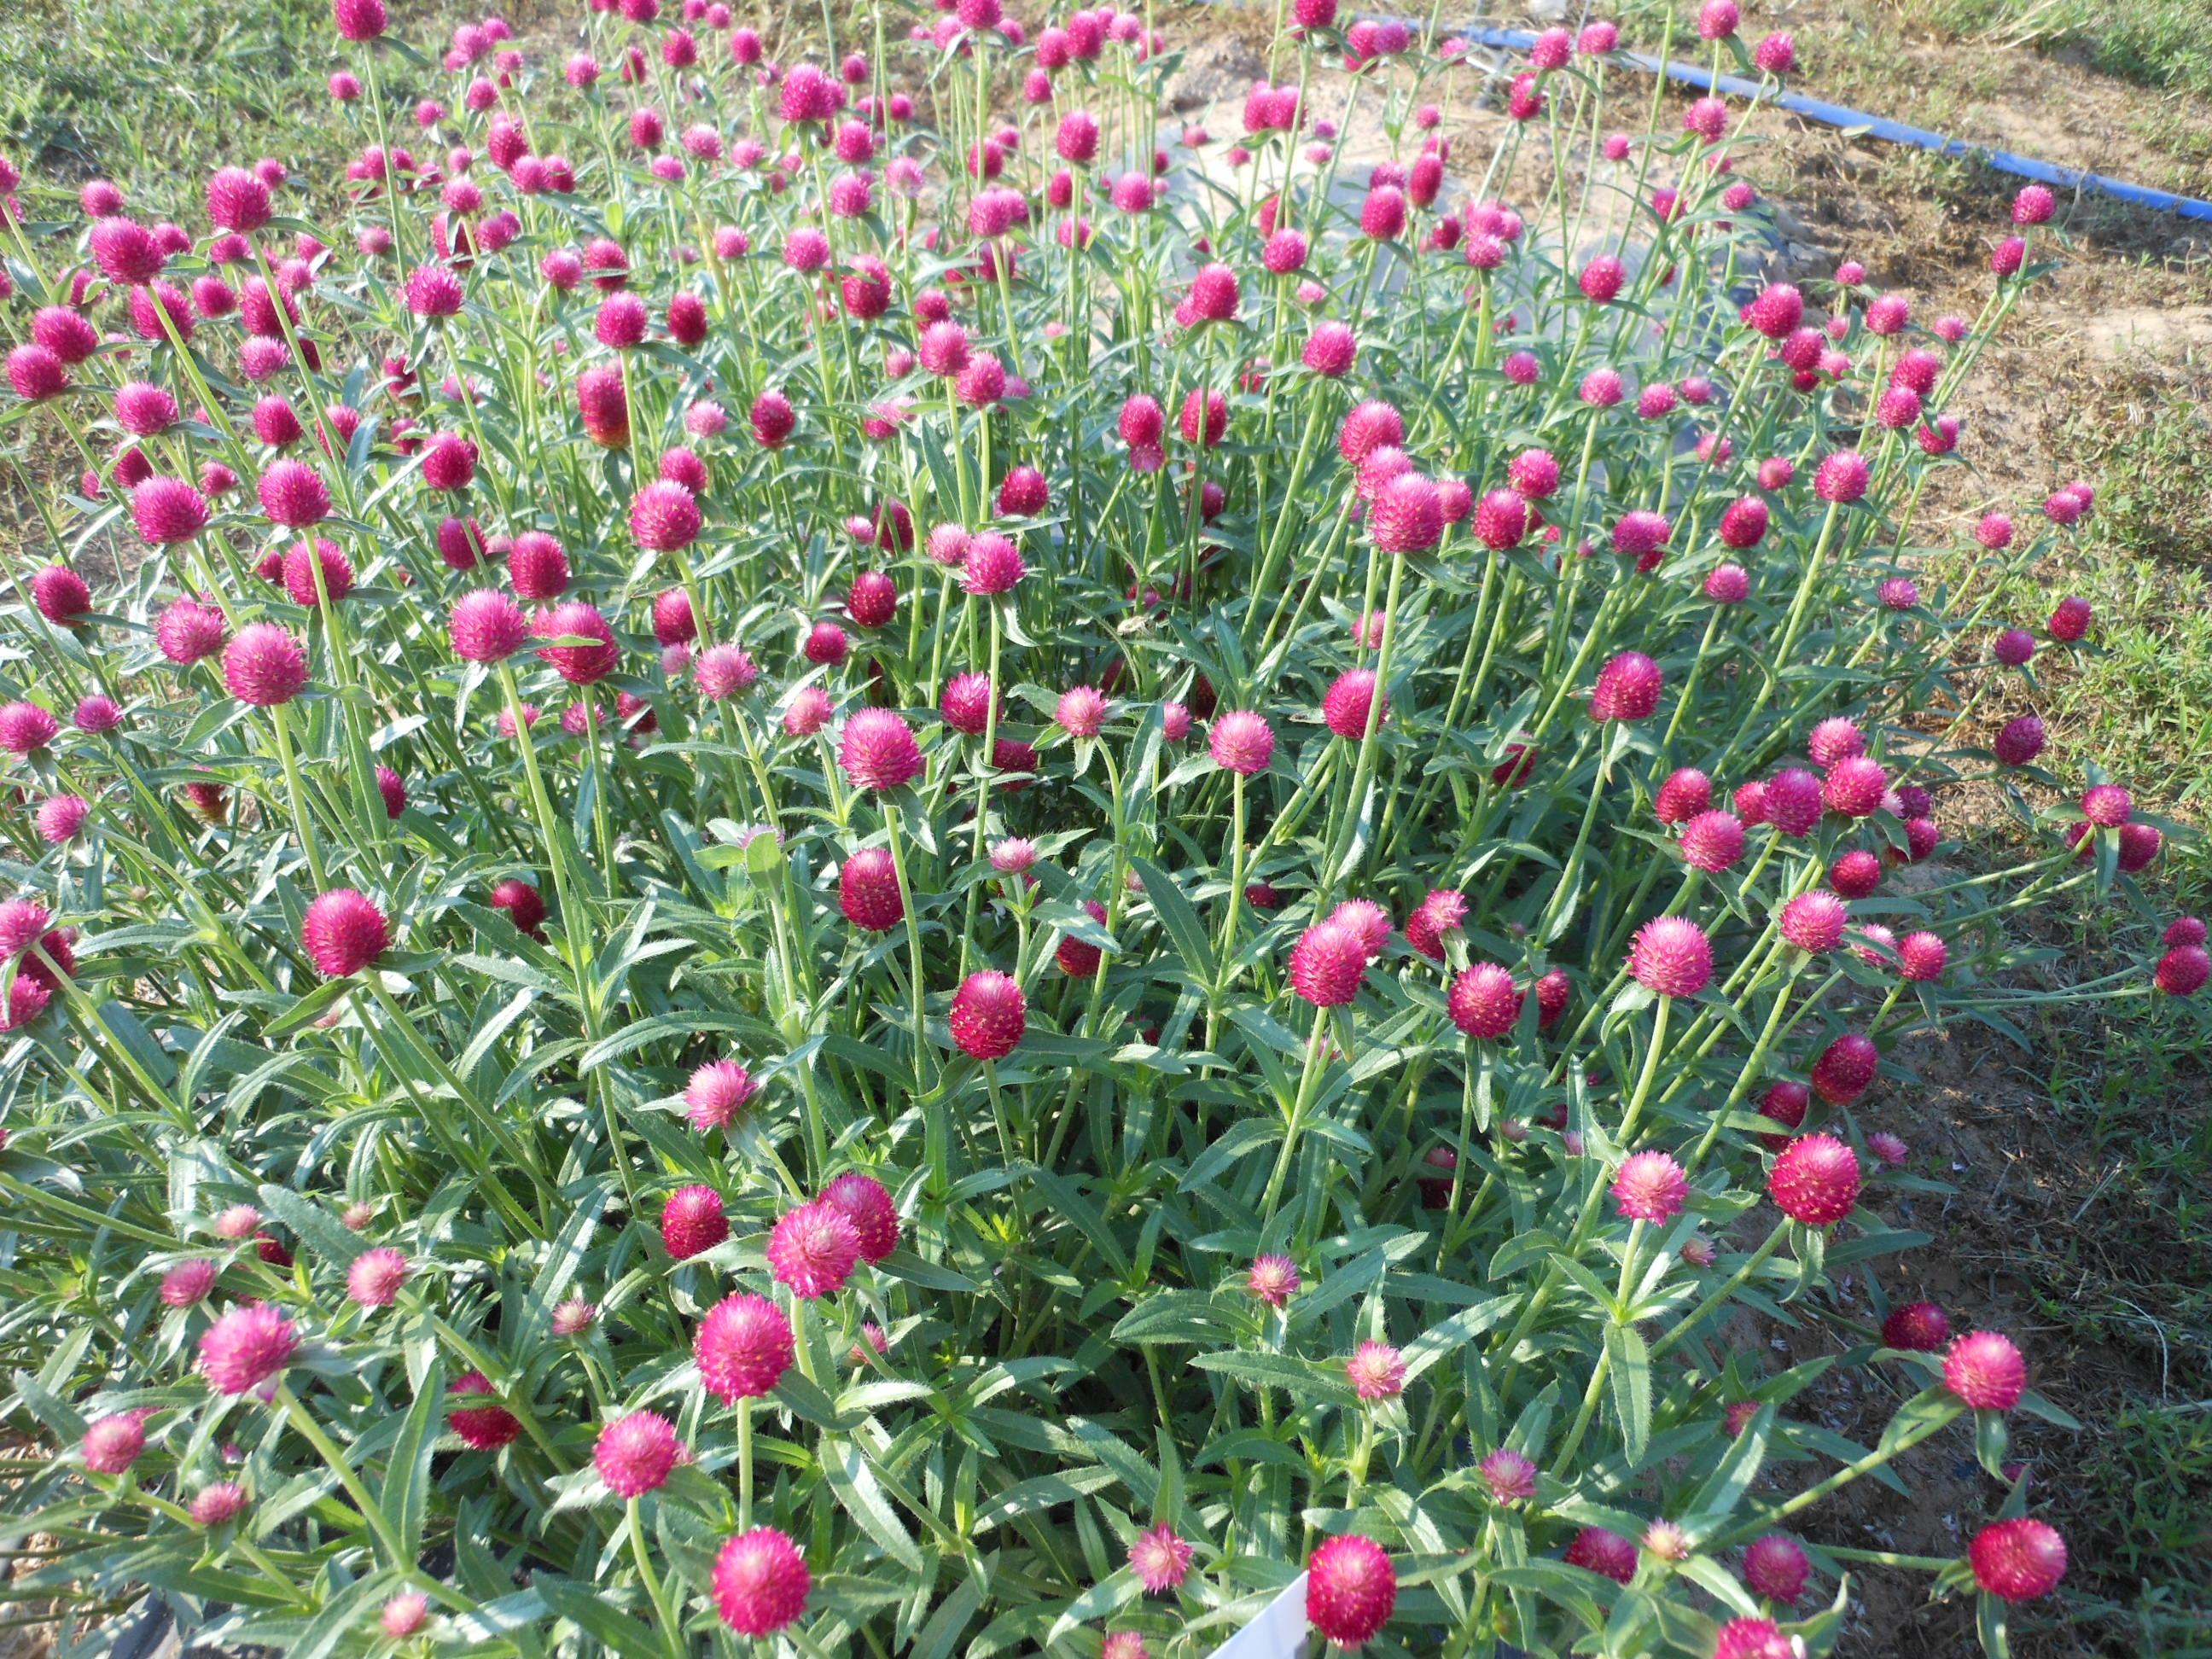 New Gomphrena Varieties Offer More Landscape Options